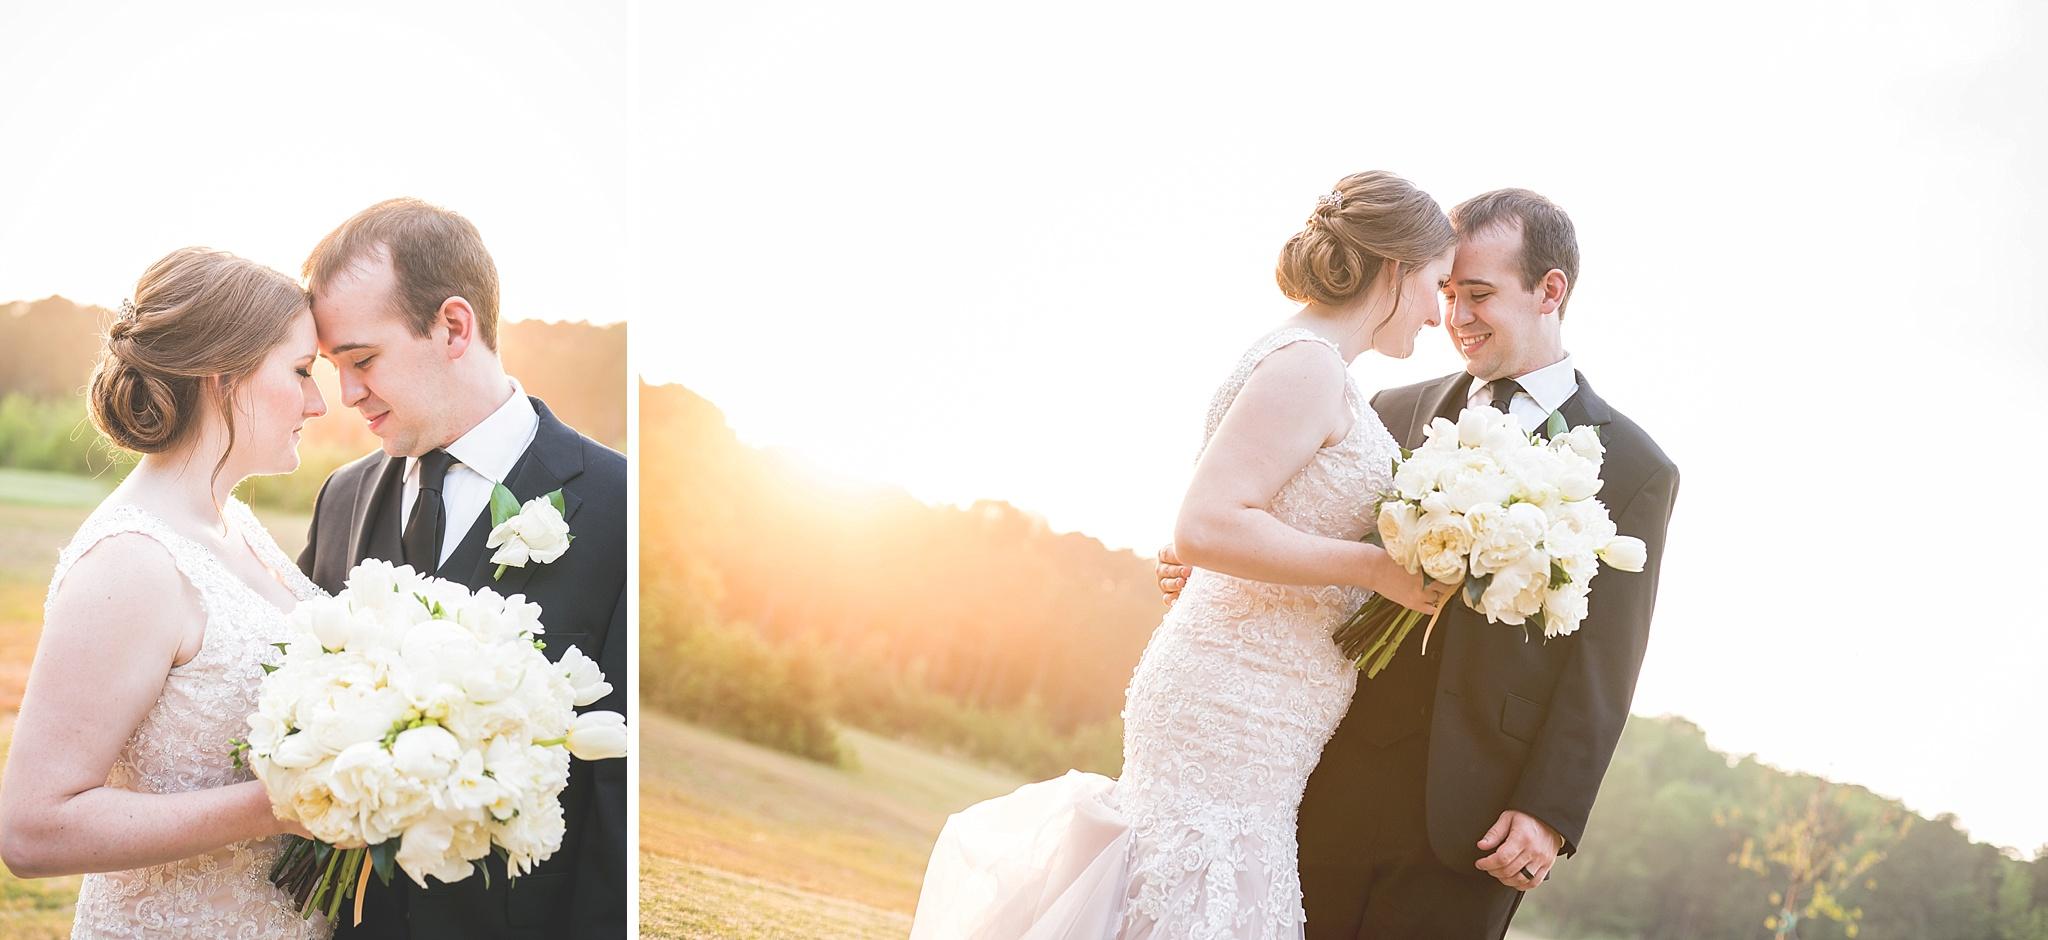 Pavilion-Carriage-Farms-Wedding-Photographer-223.jpg